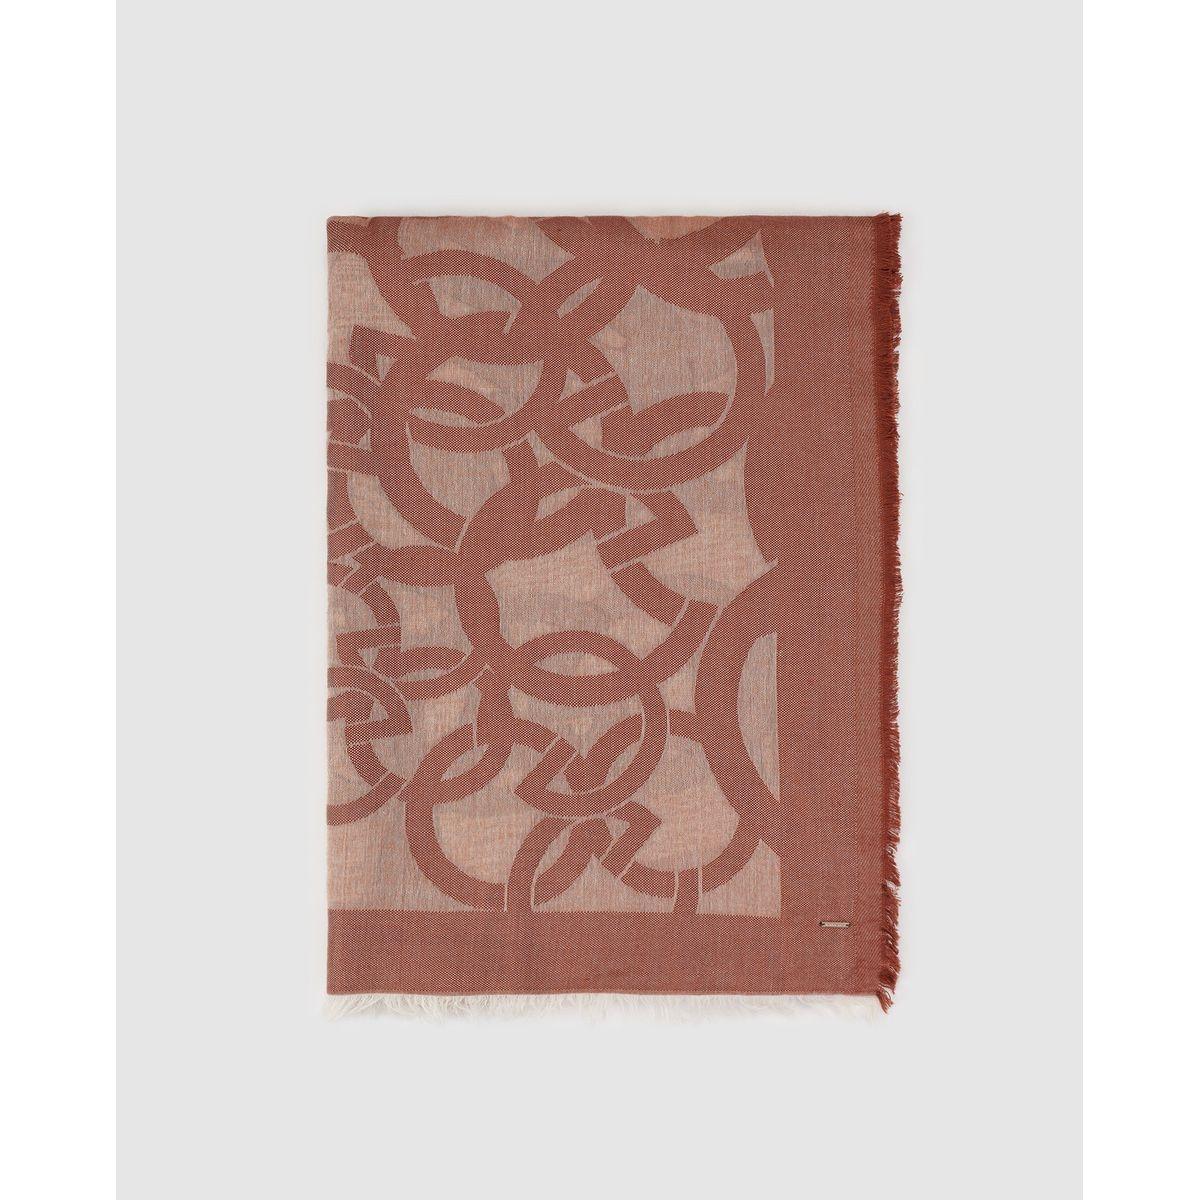 Grand foulard  avec imprimé de la marque